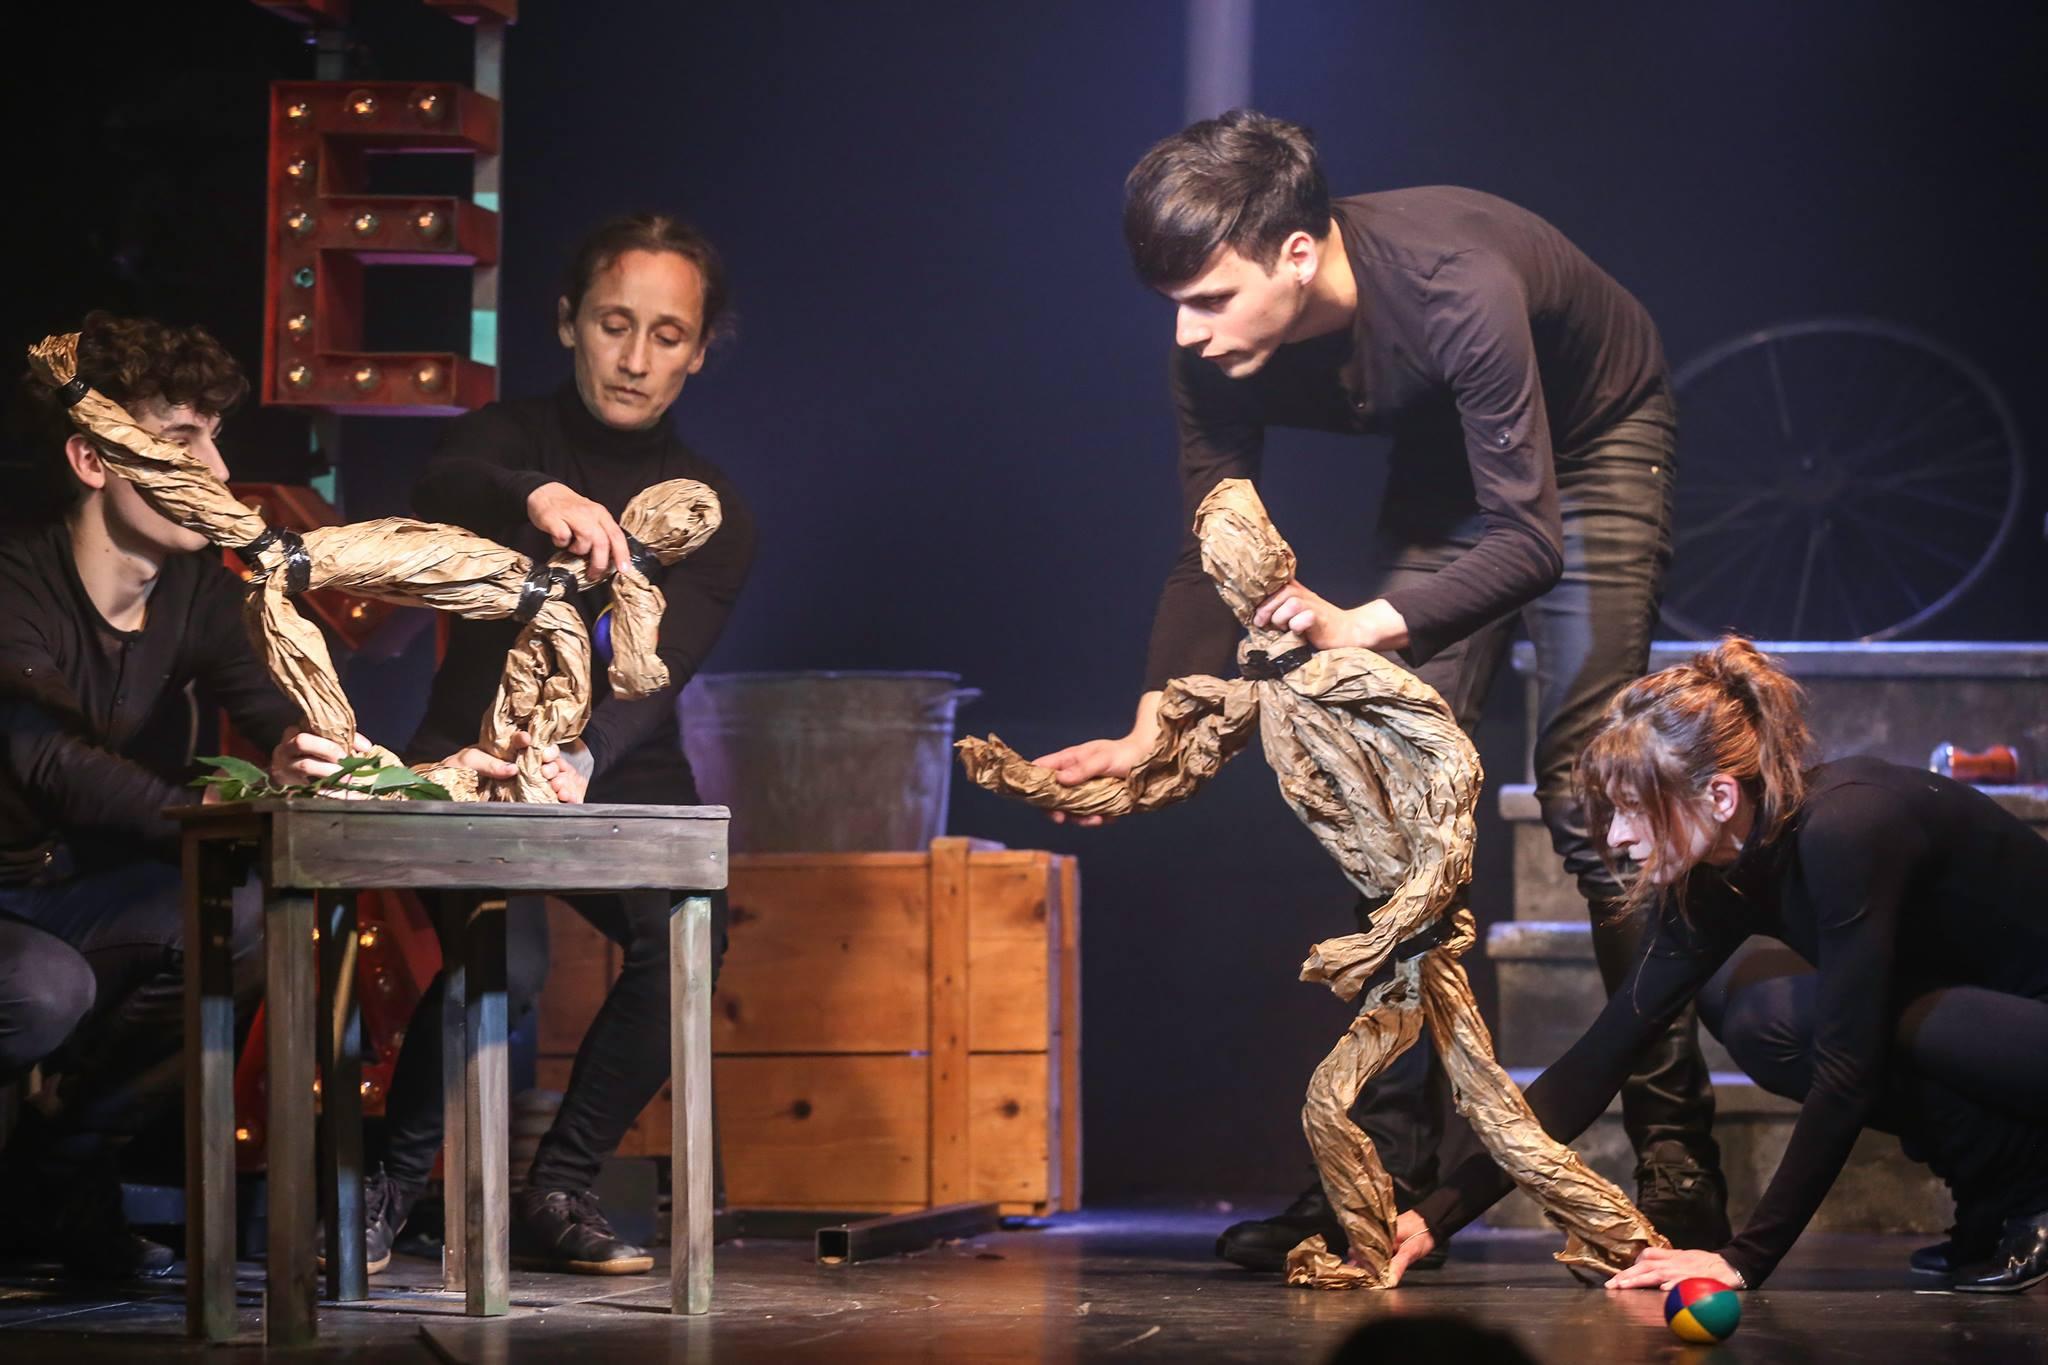 Paperman, Schubert Theater 2016, Fotos: Barbara Pálffy